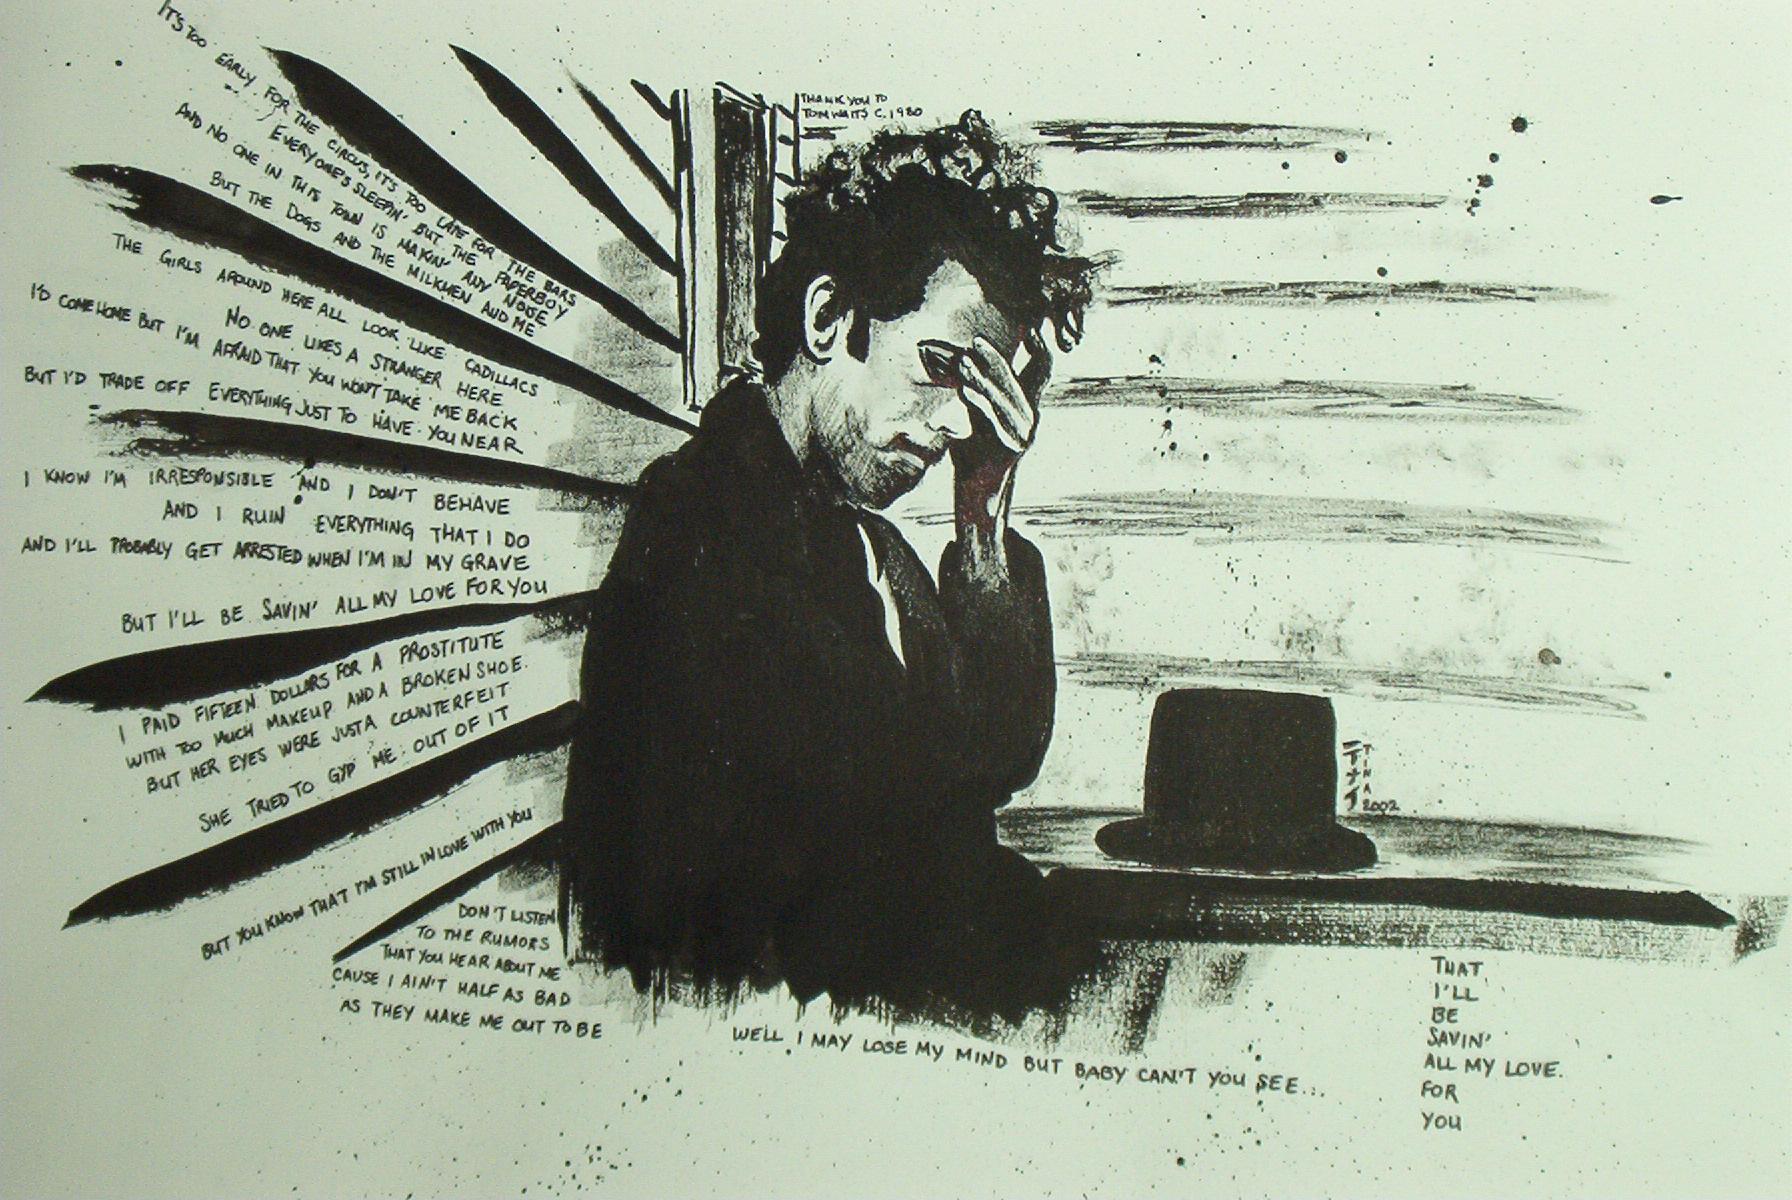 Tom Waits by Perplexity66 on DeviantArt